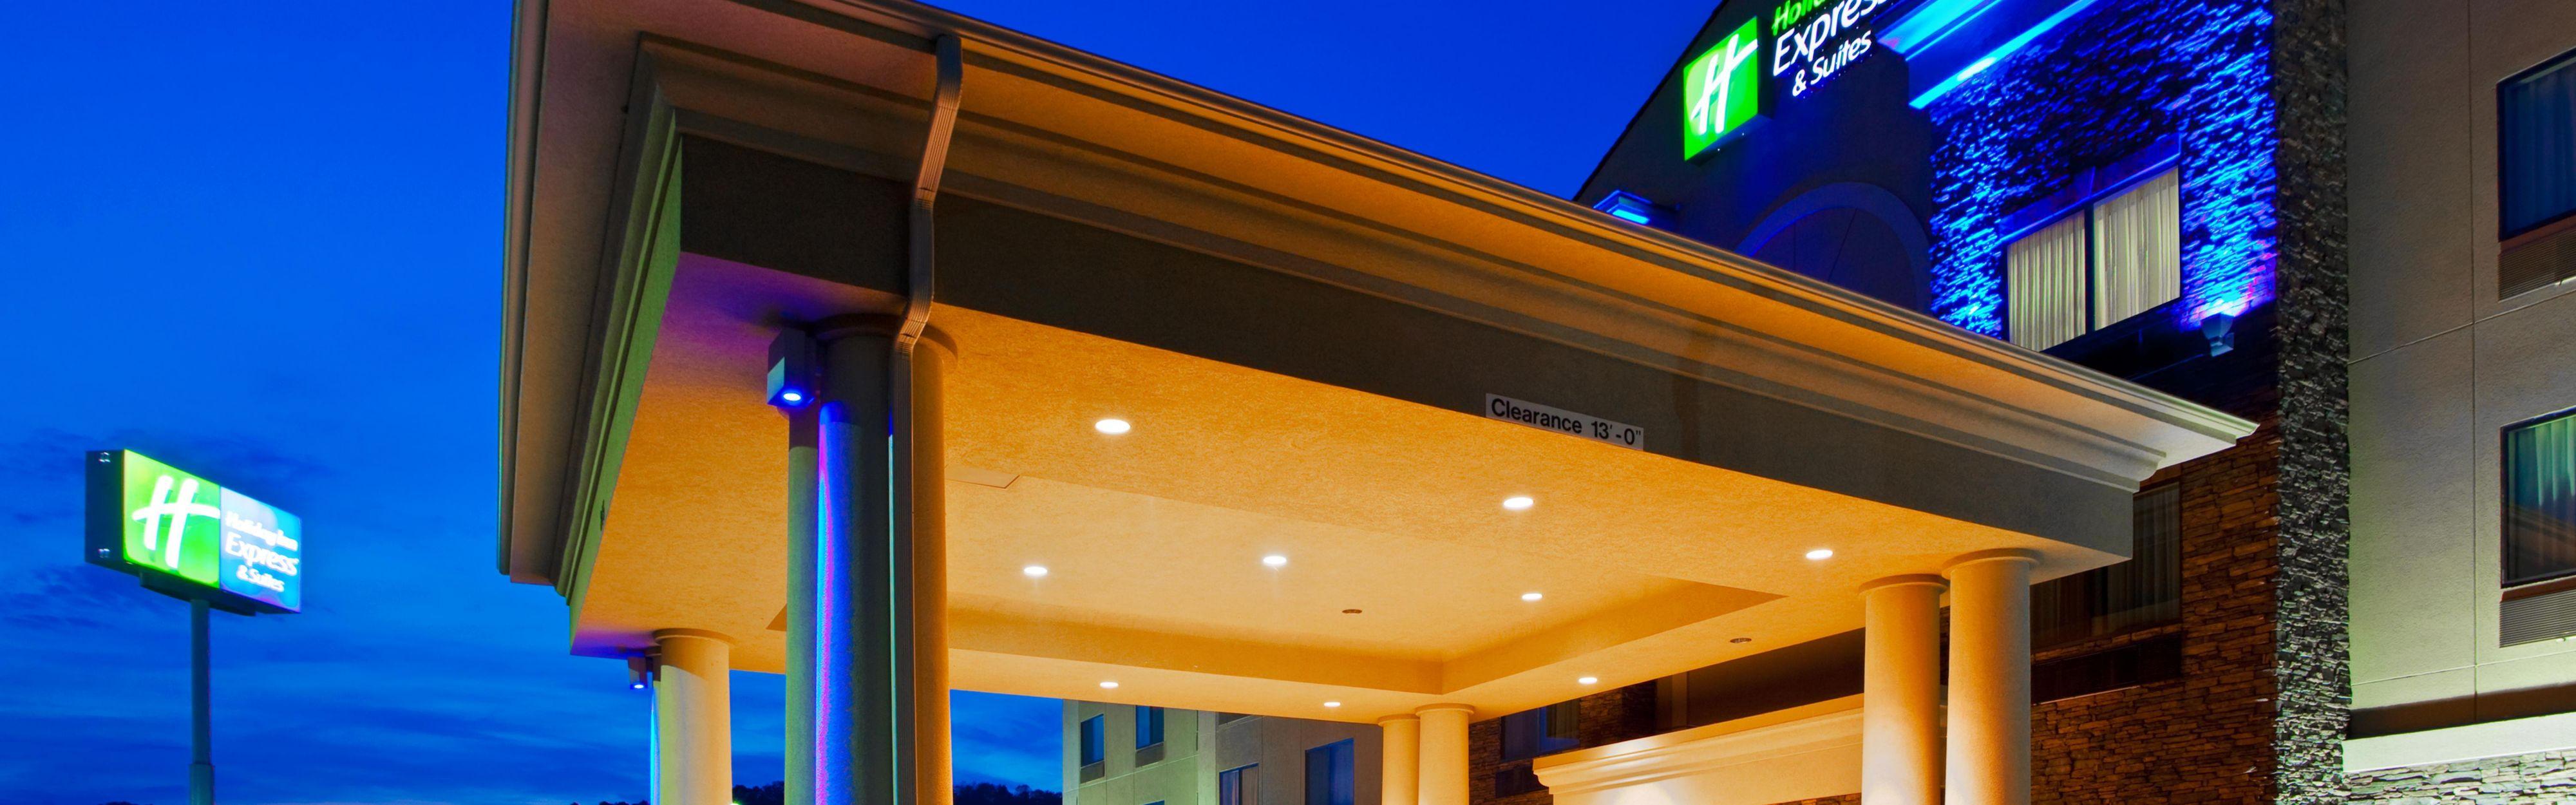 Holiday Inn Express & Suites Weston image 0